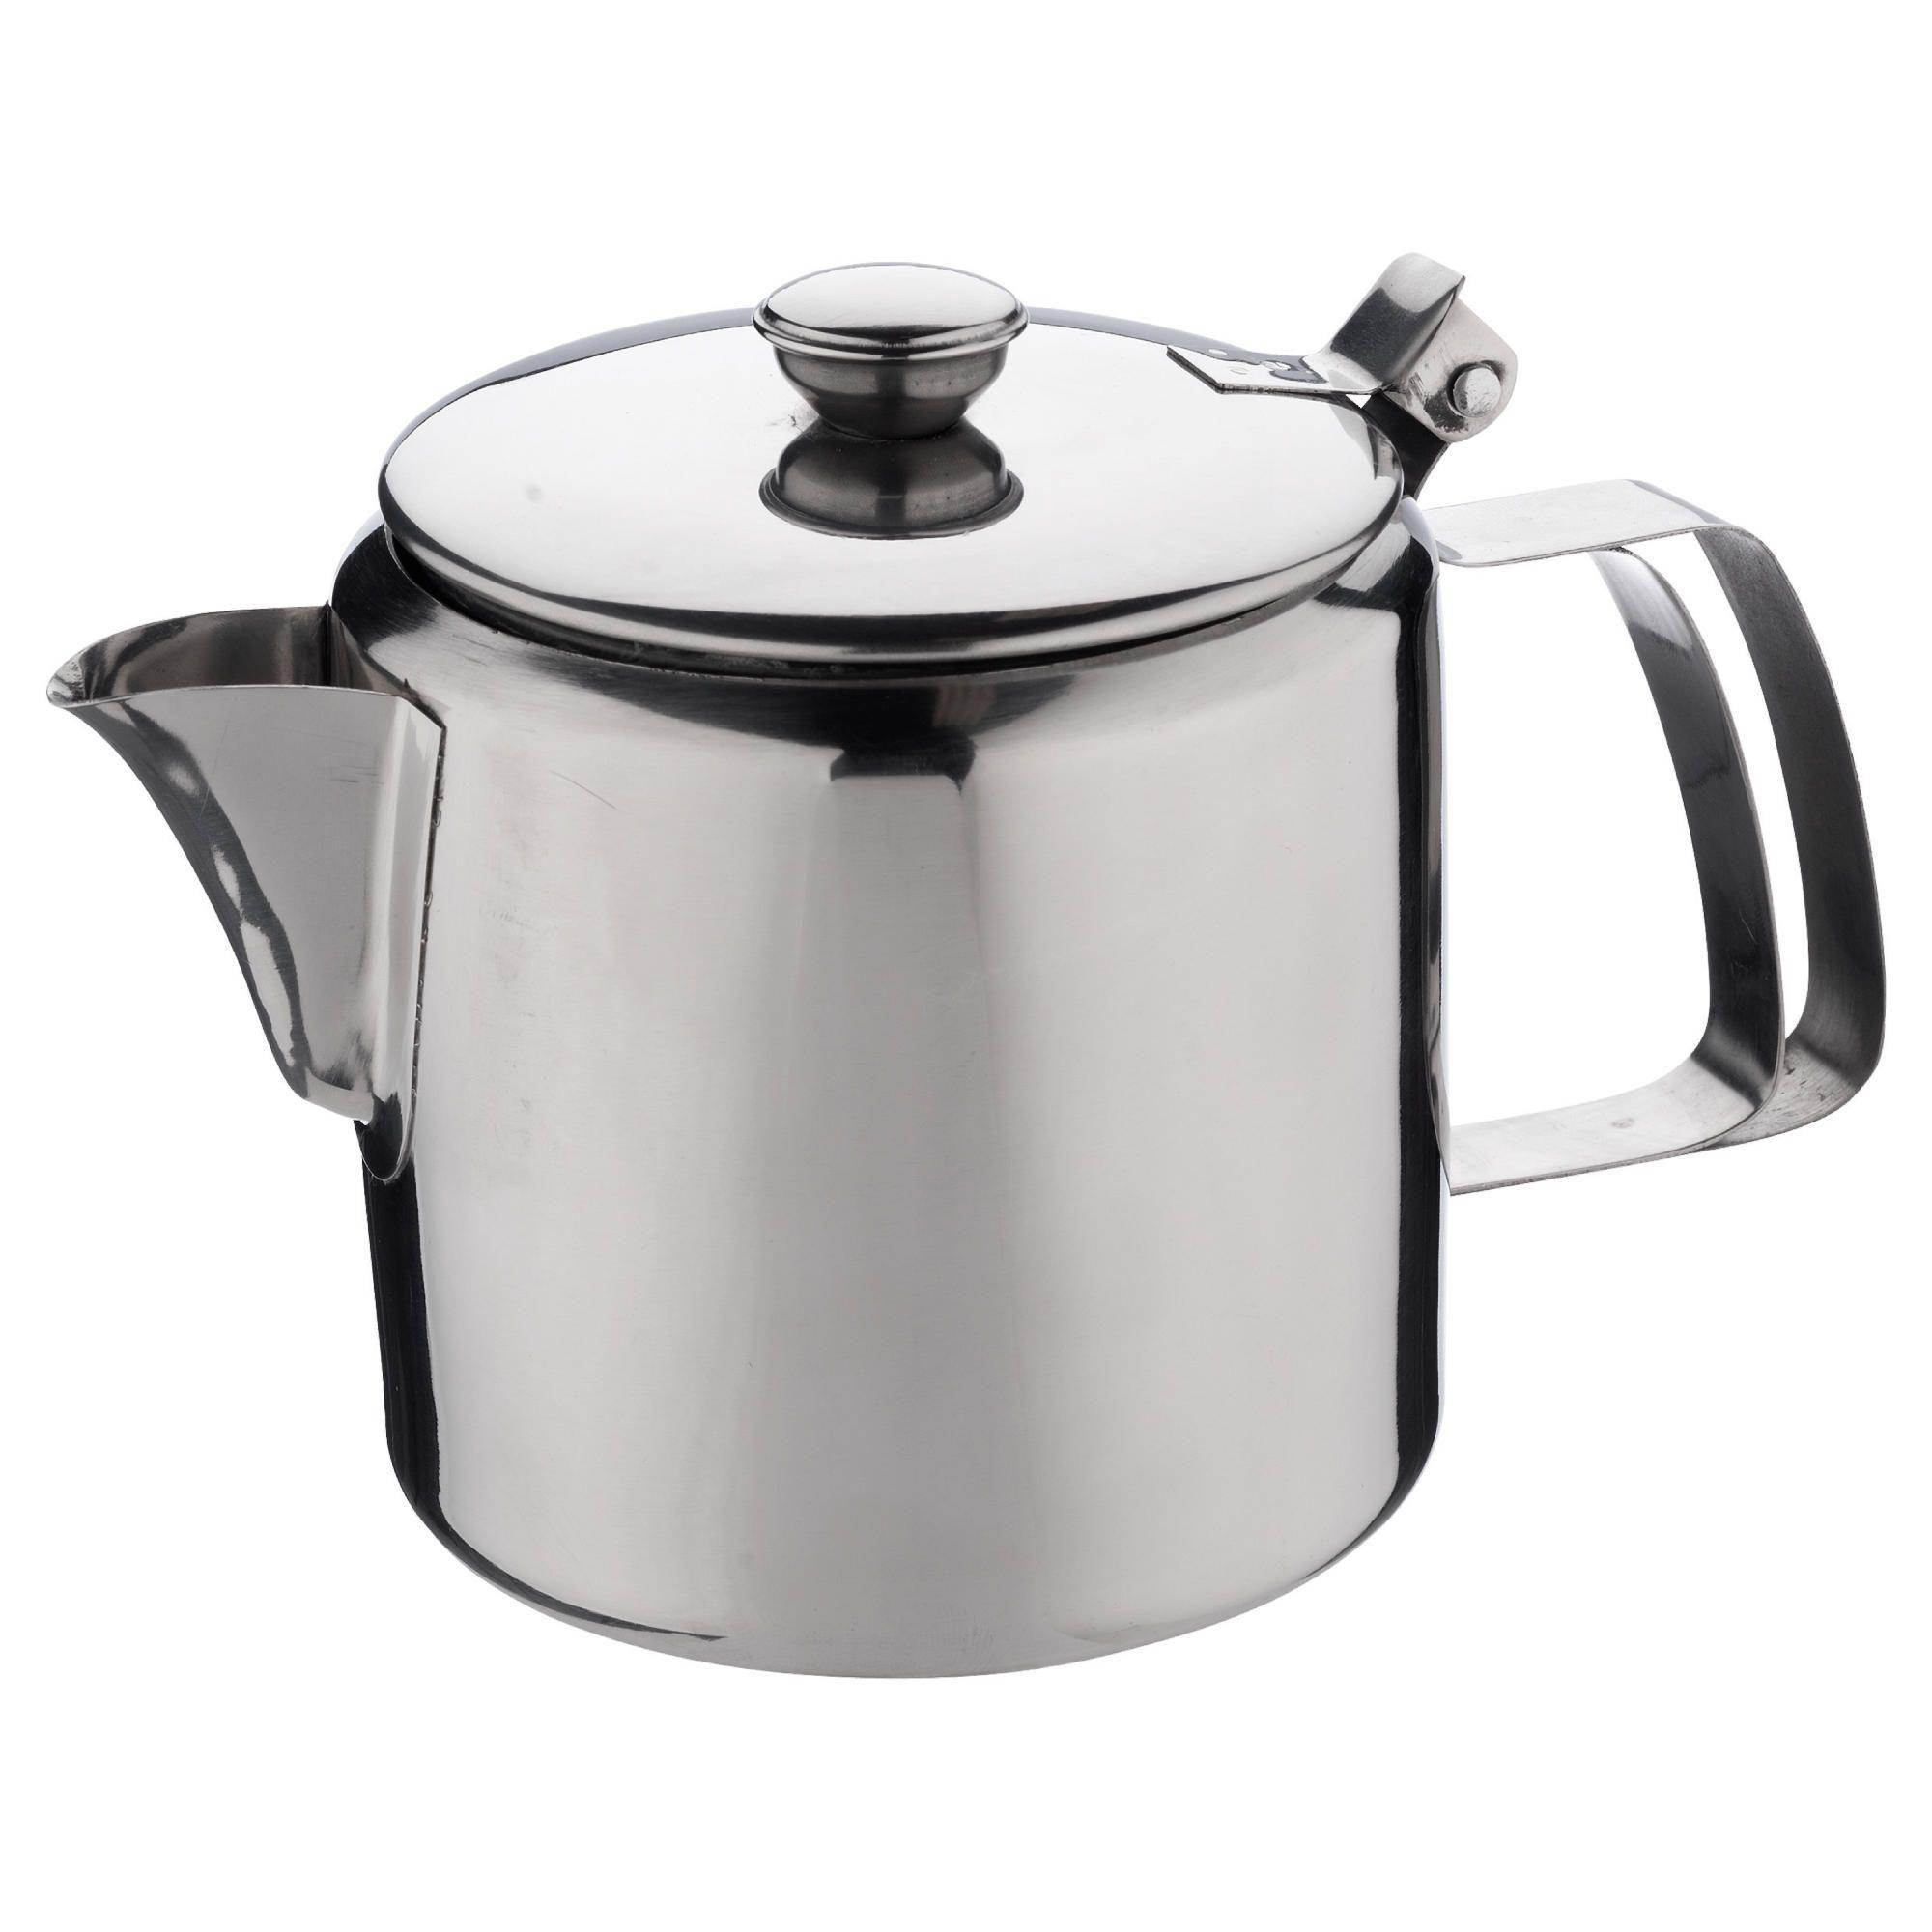 Tesco Small Stainless Steel Teapot